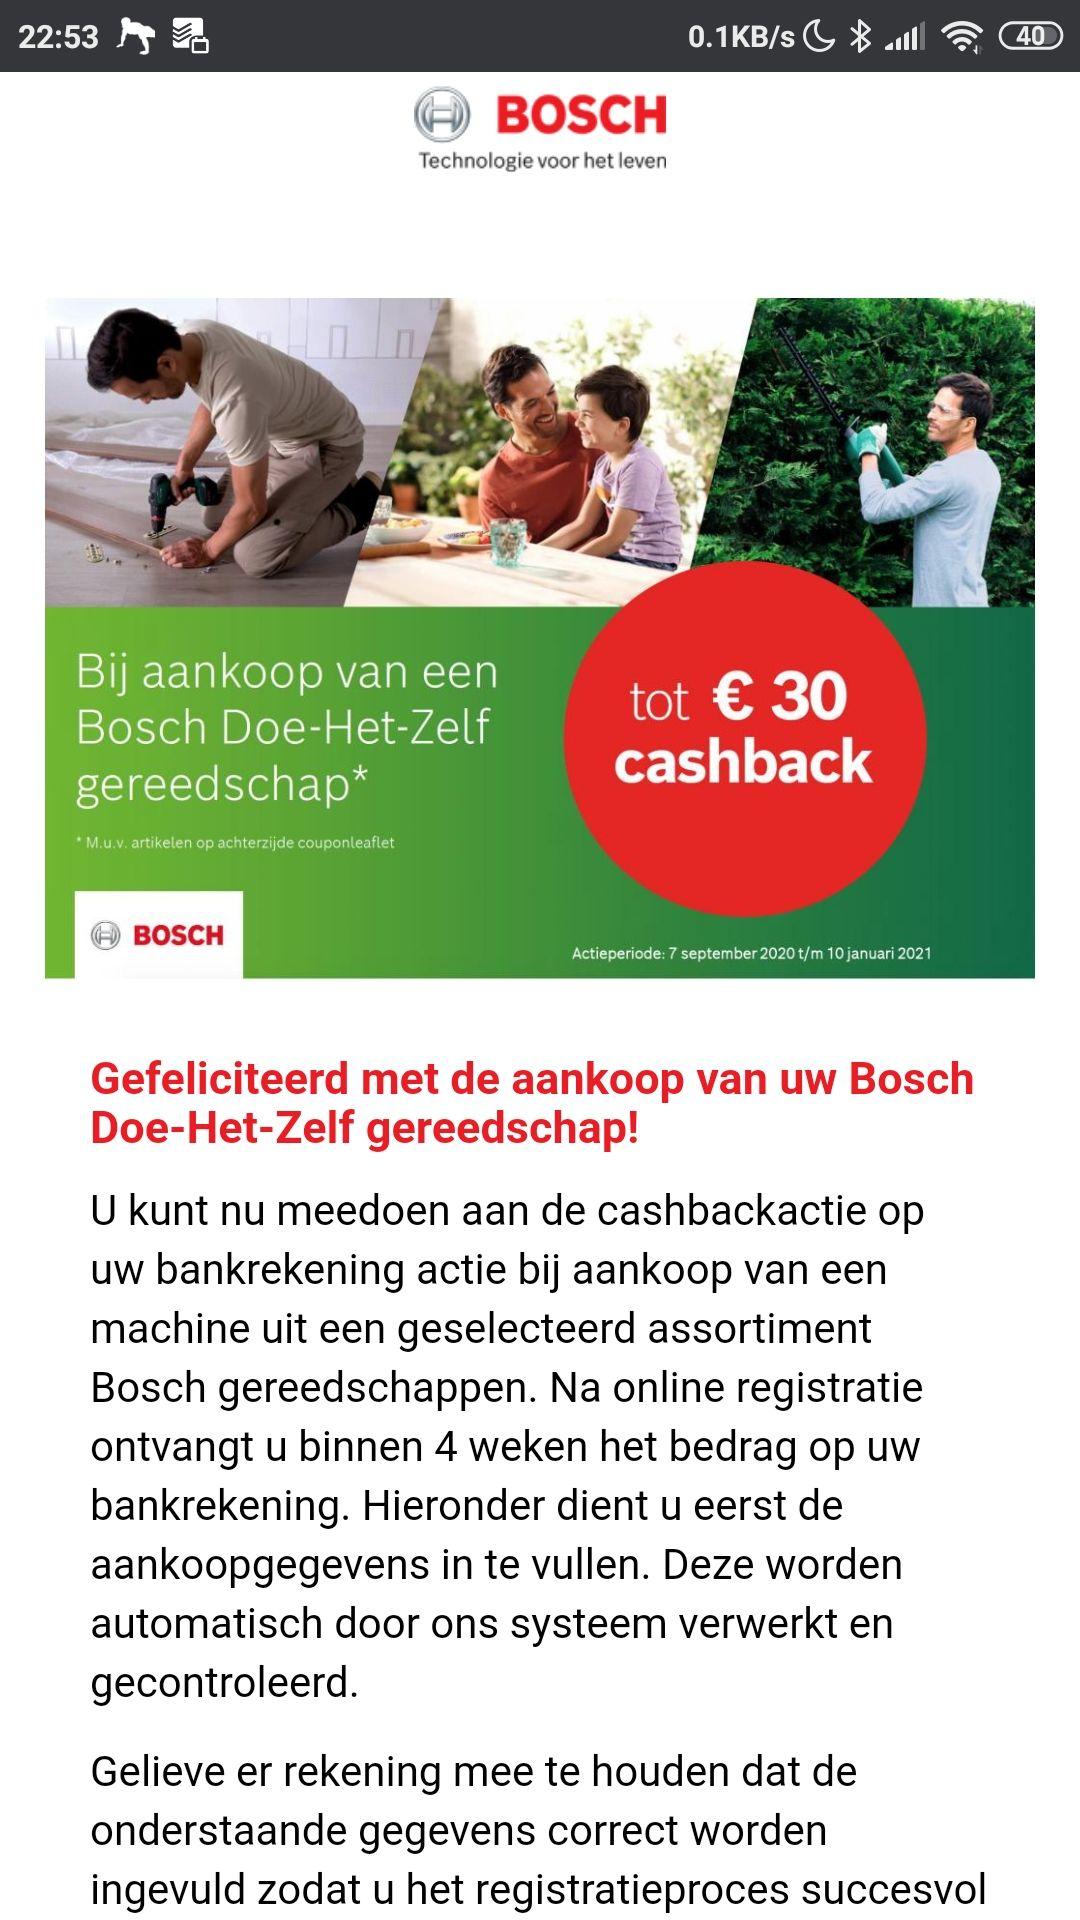 Bosch gereedschap cashback tot €30 retour of gratis accu